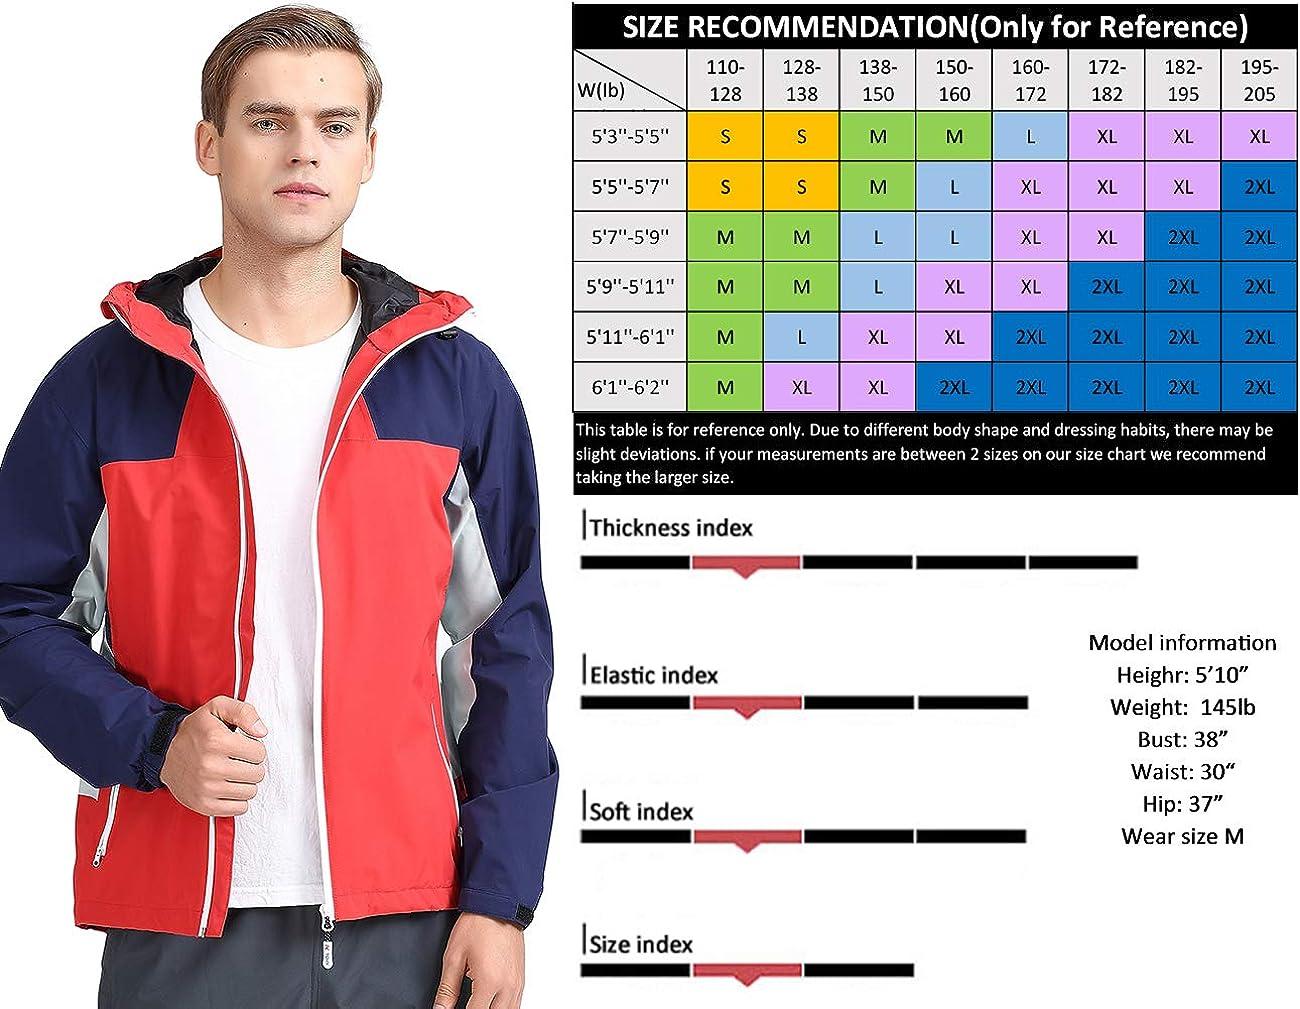 Arasiyama Mens Lightweight Hooded Raincoat Slim Fit Casual Windbreaker Waterproof Rain Jacket Sportswear for Outdoor